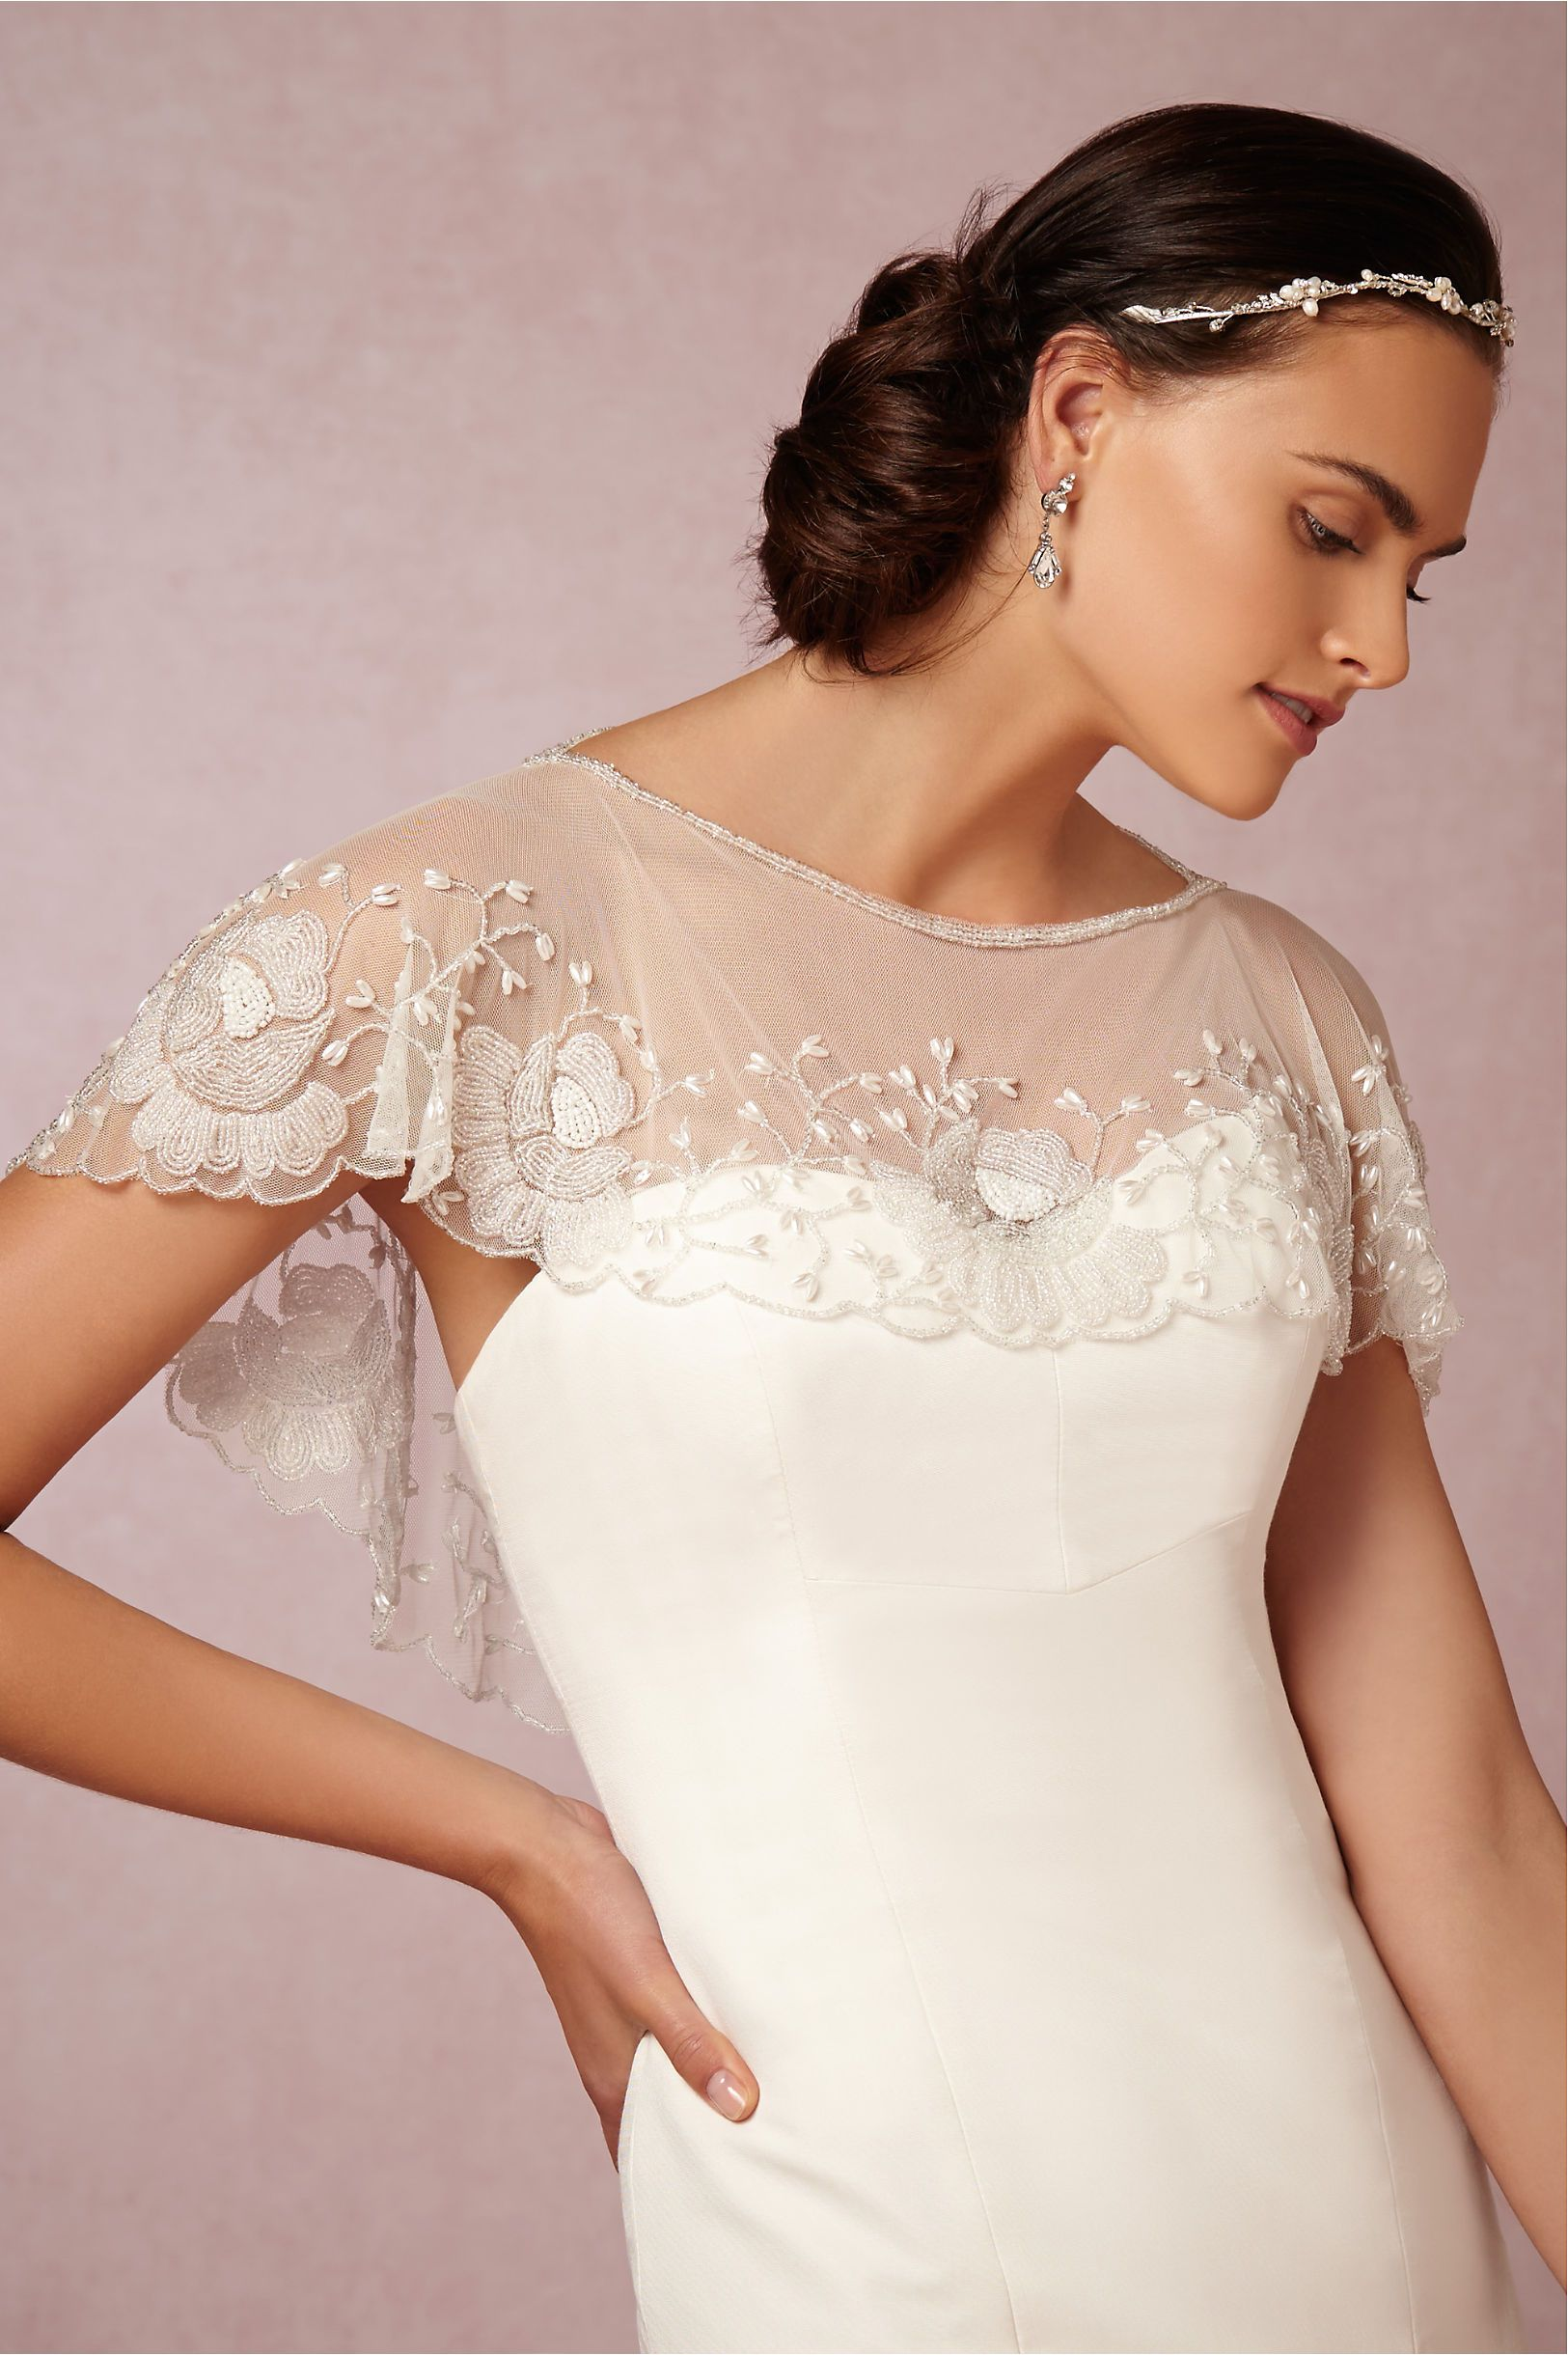 Peony Topper In New Attire At Bhldn Wedding Dresses Wedding Dress Bolero Bride Bridal